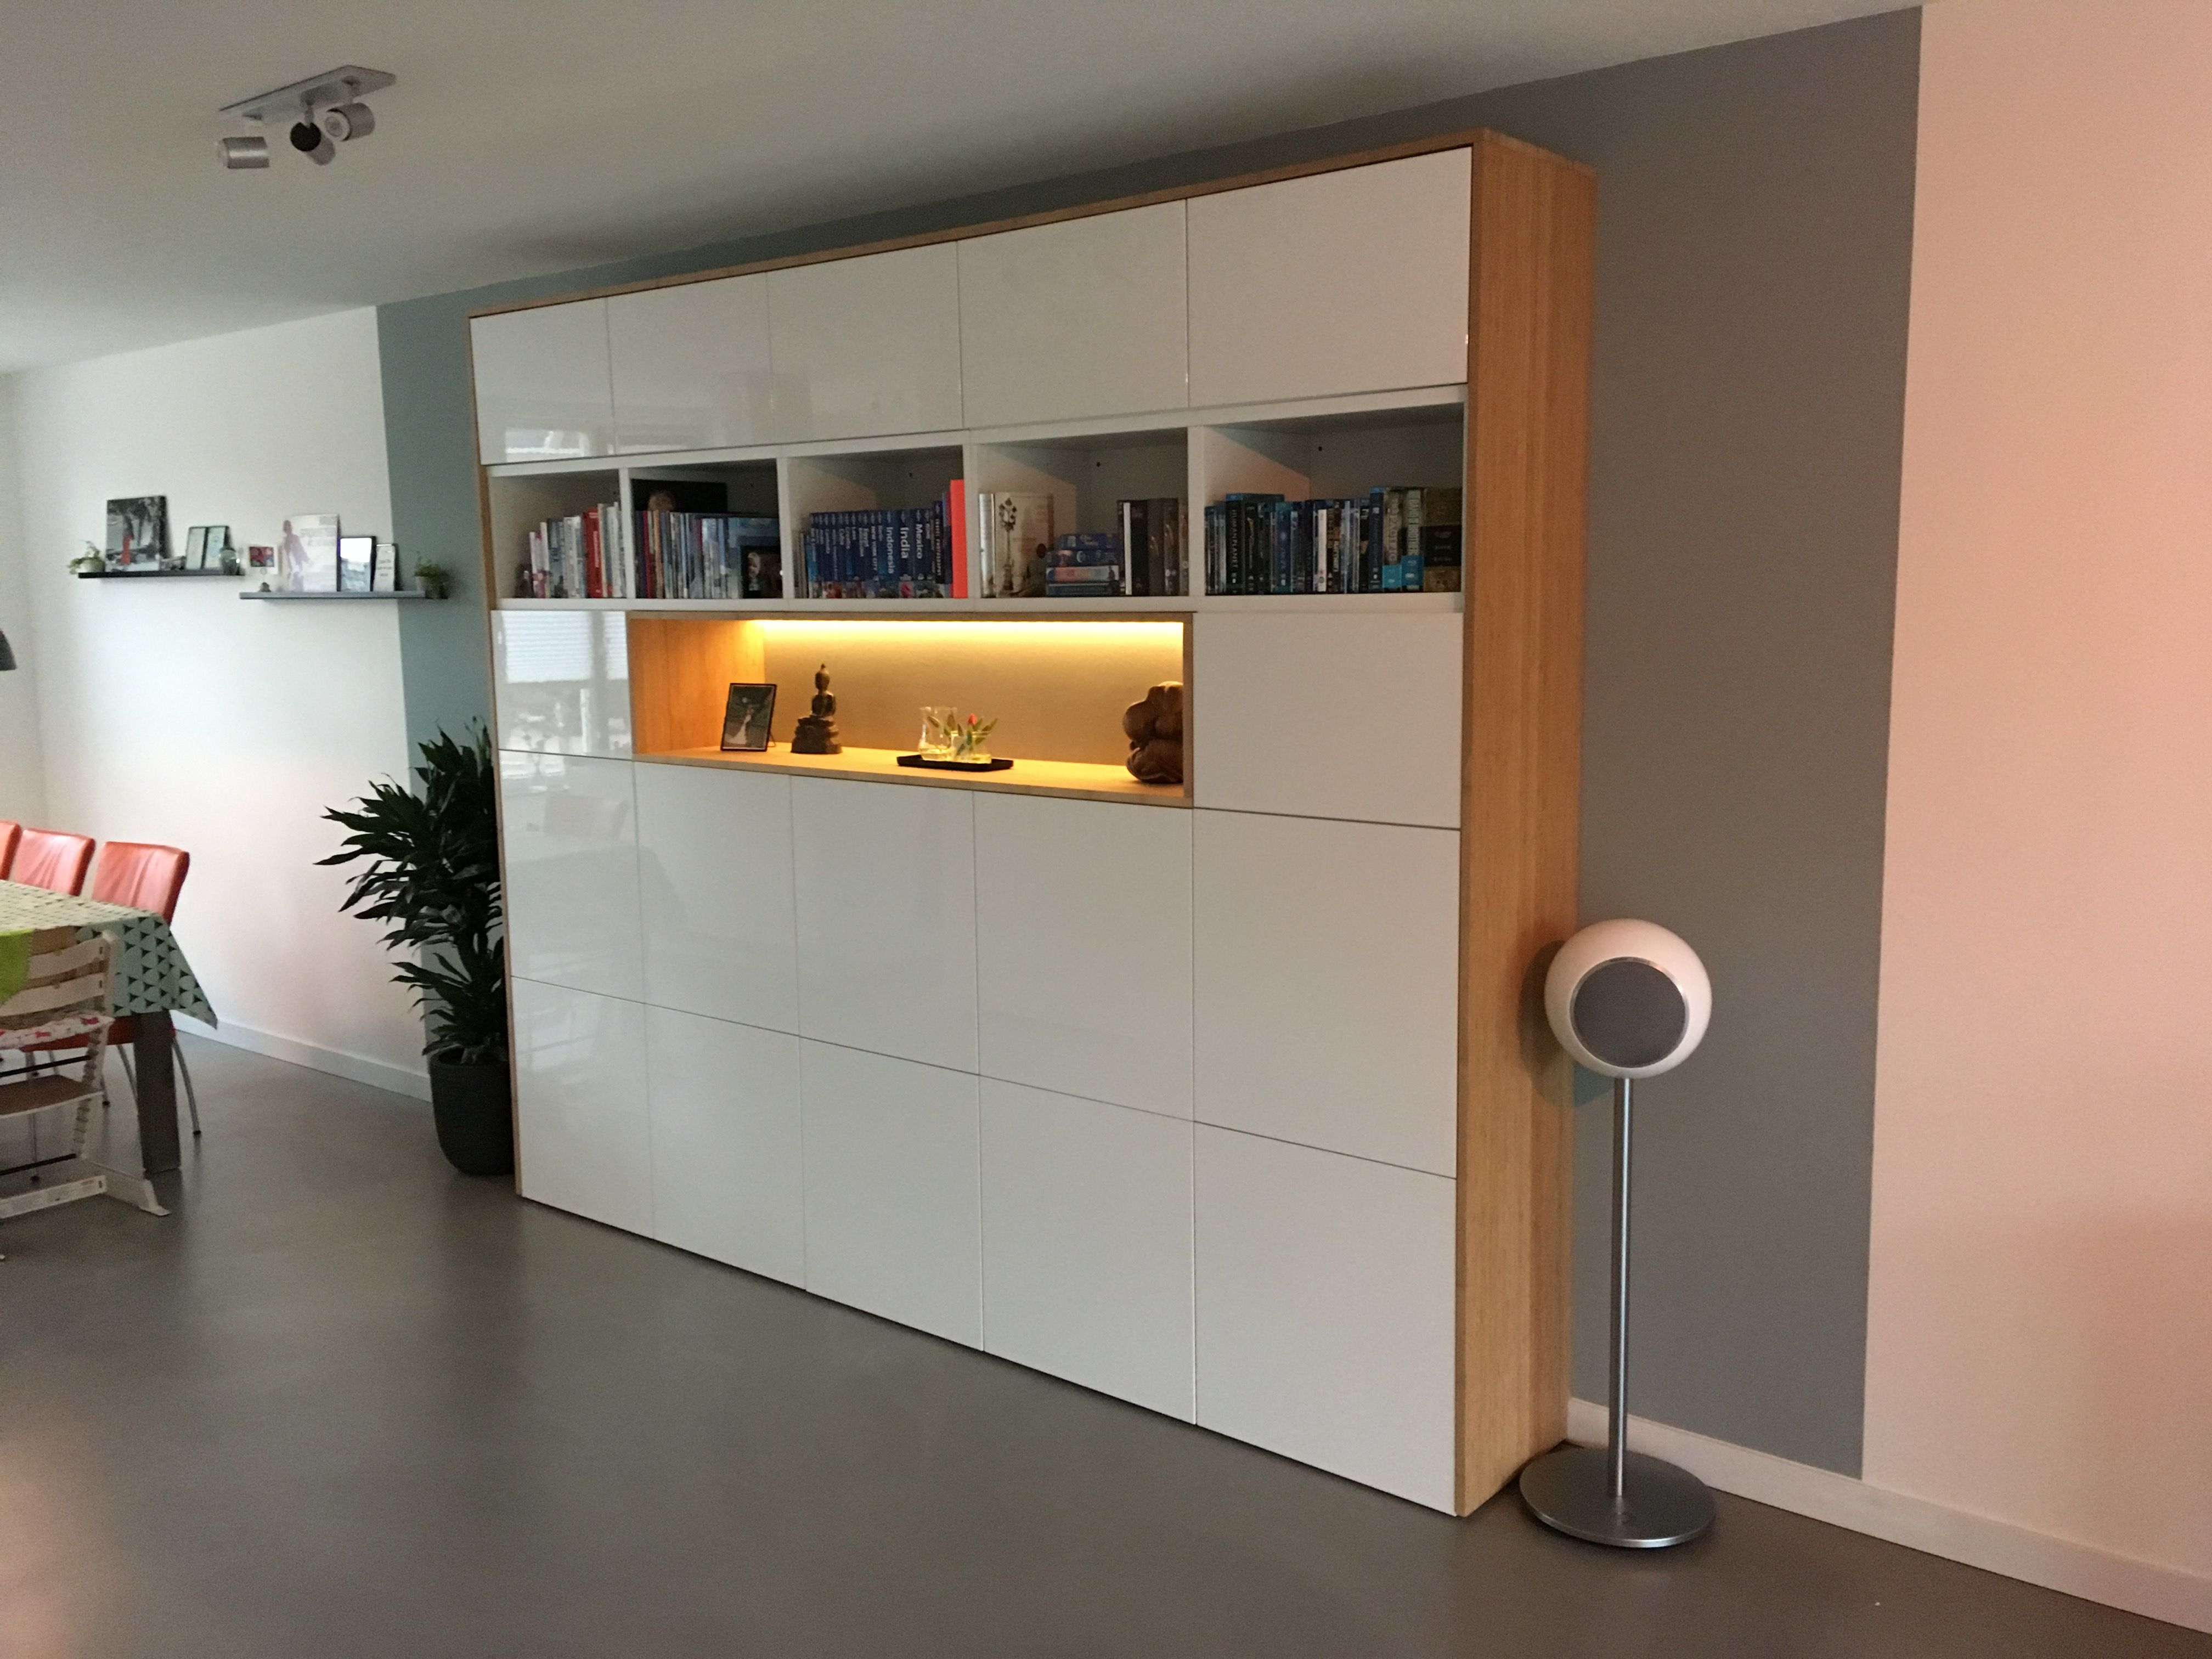 Epingle Sur Ikea Furniture Mobel Hack Ideas Ideen